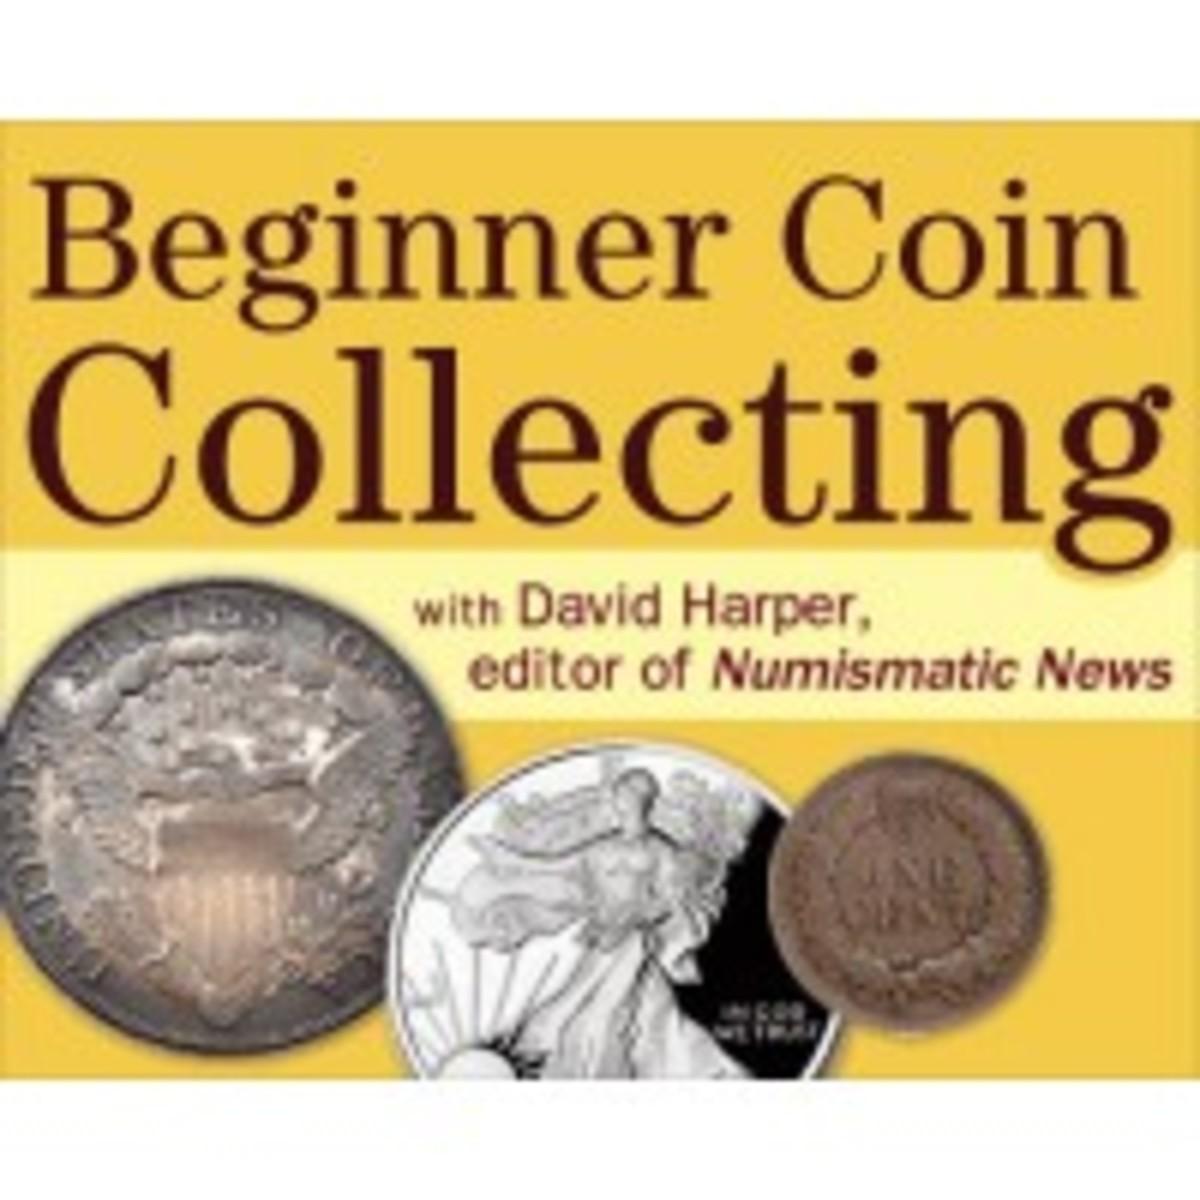 Beginner Coin Collecting Online Seminar